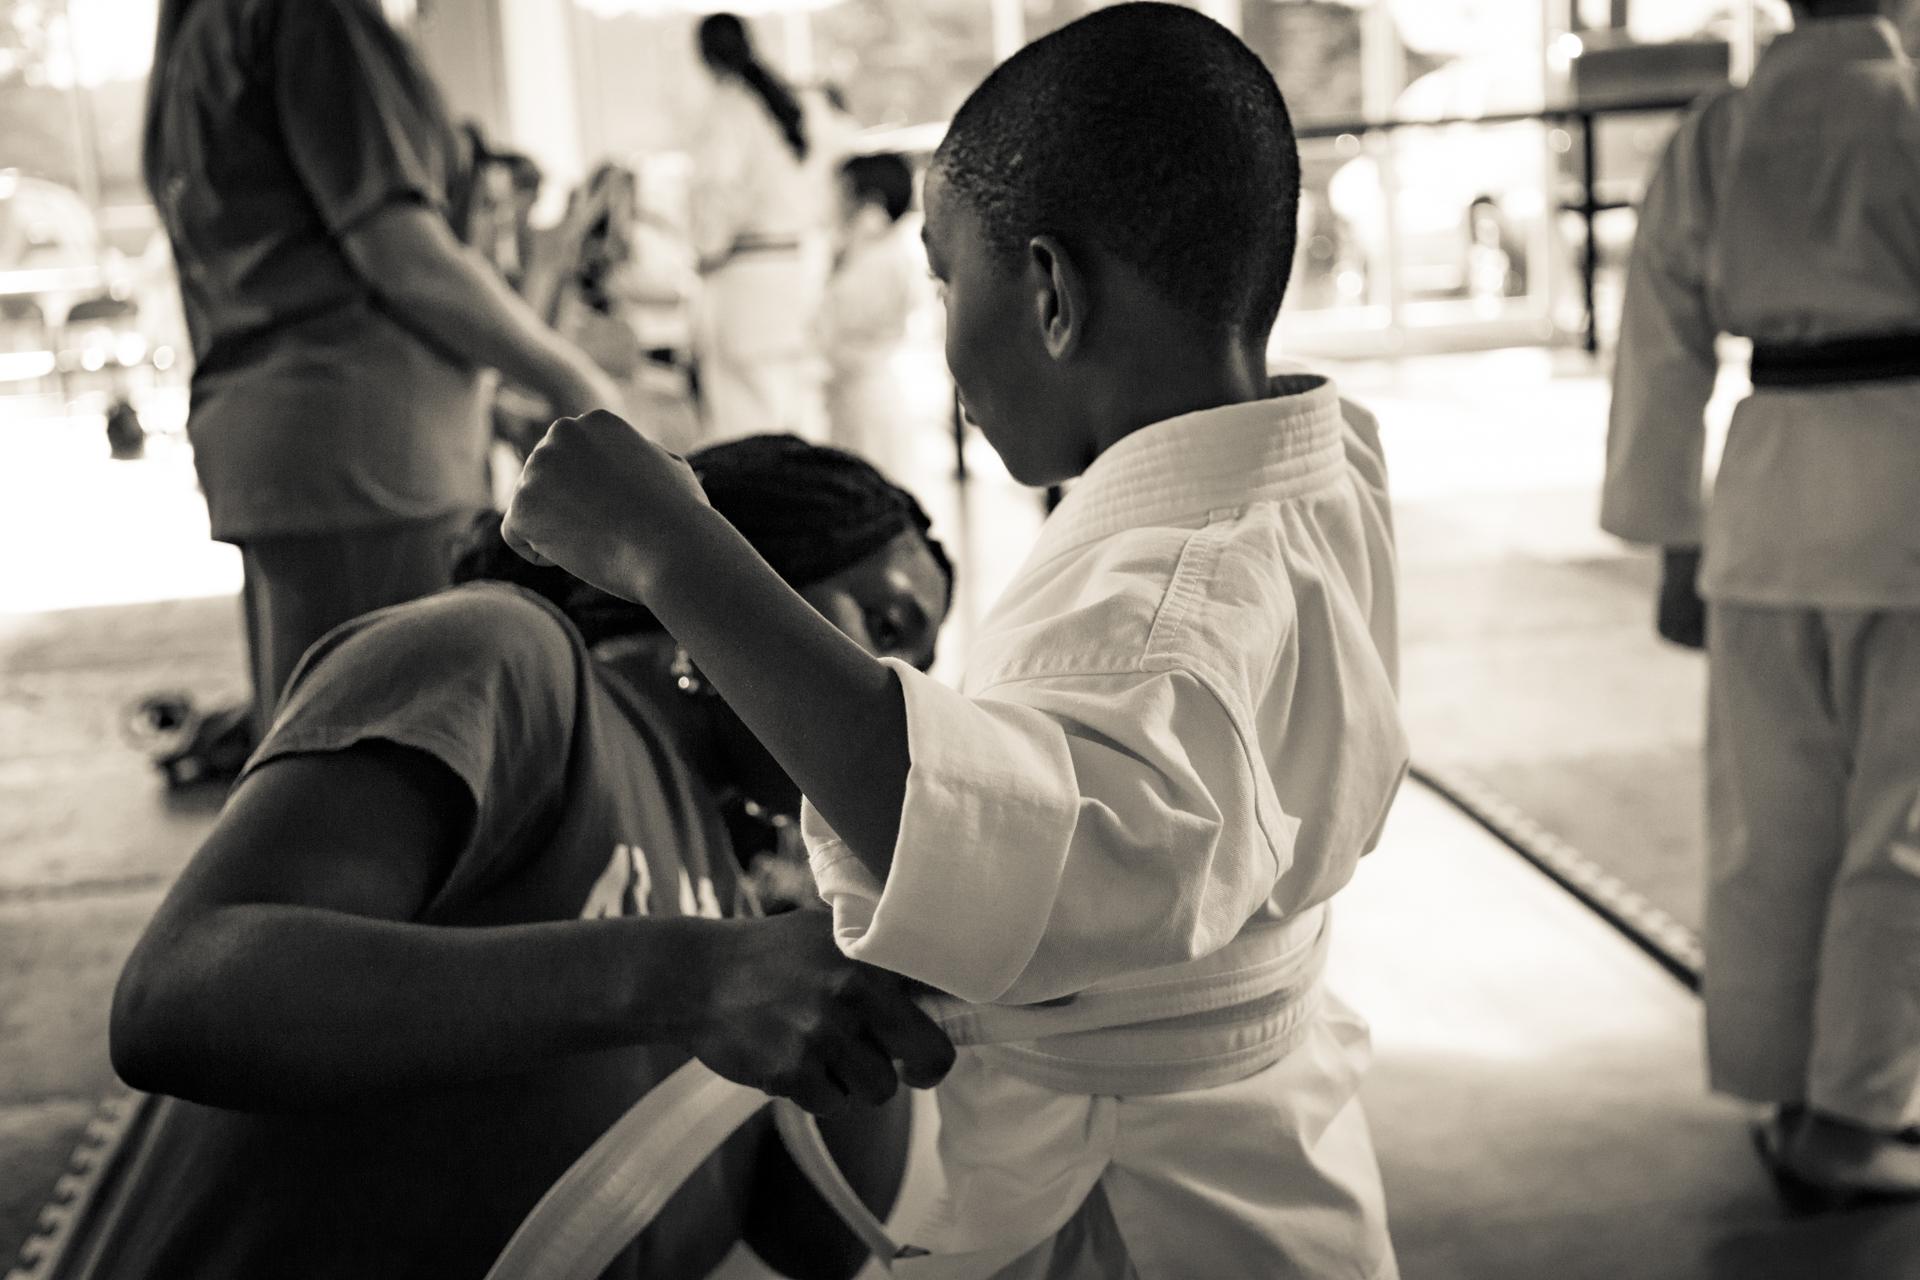 Getting started at Impact Martial Arts Pelham AL